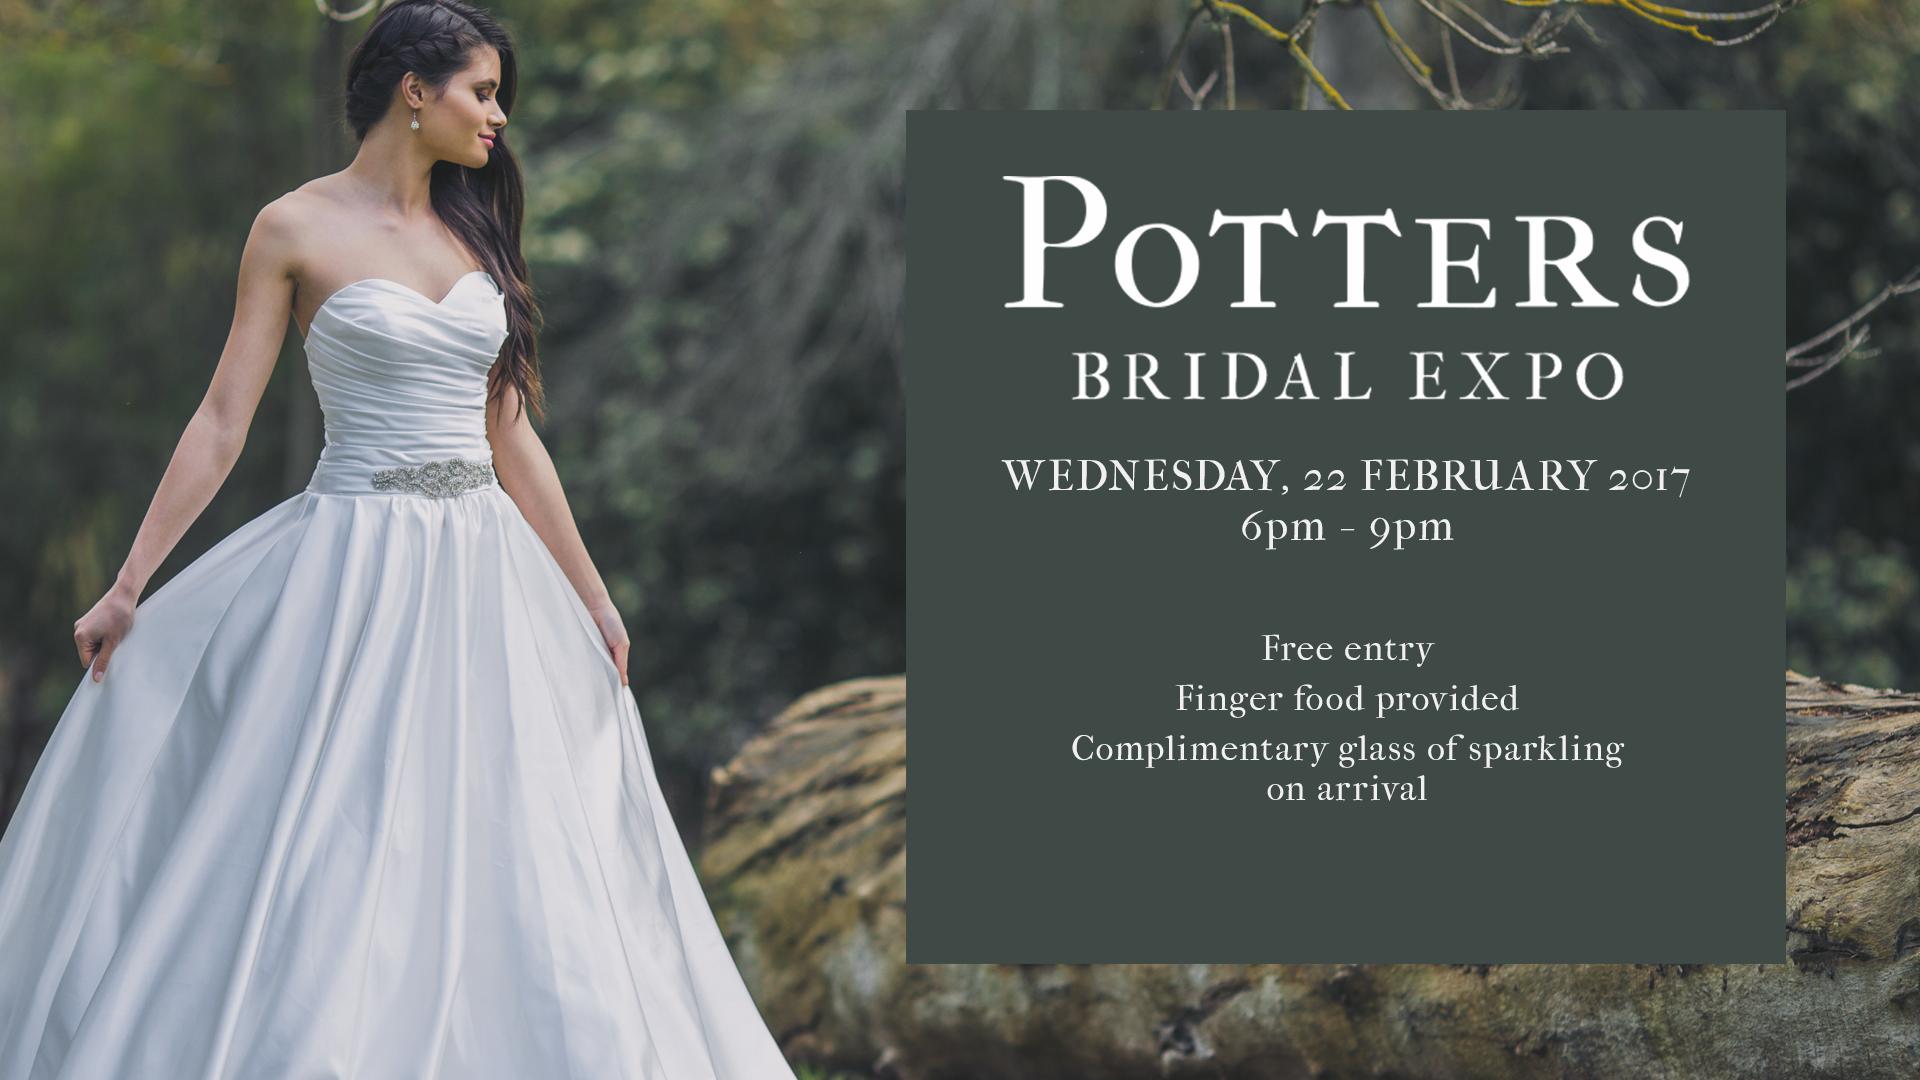 Wedding Bridal Expo at Potters Receptions